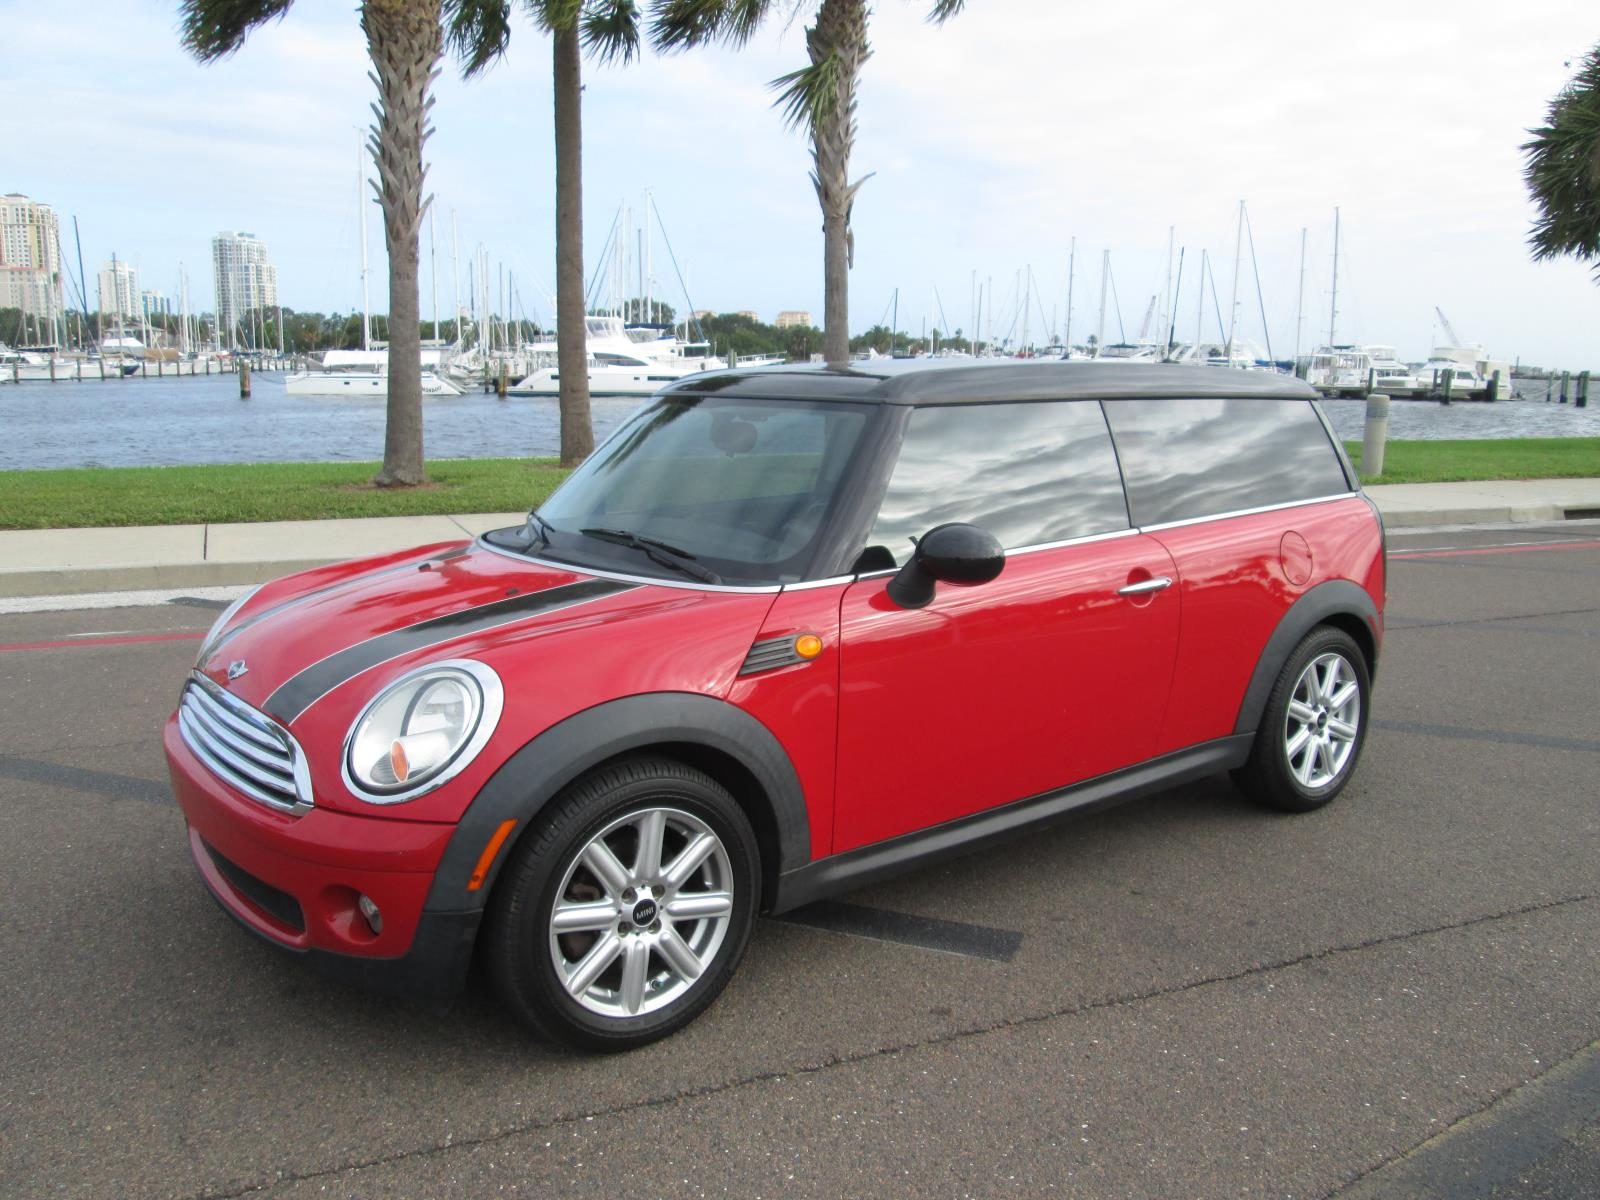 2010 Mini Cooper Clubman 6 Sd Manual Great Car